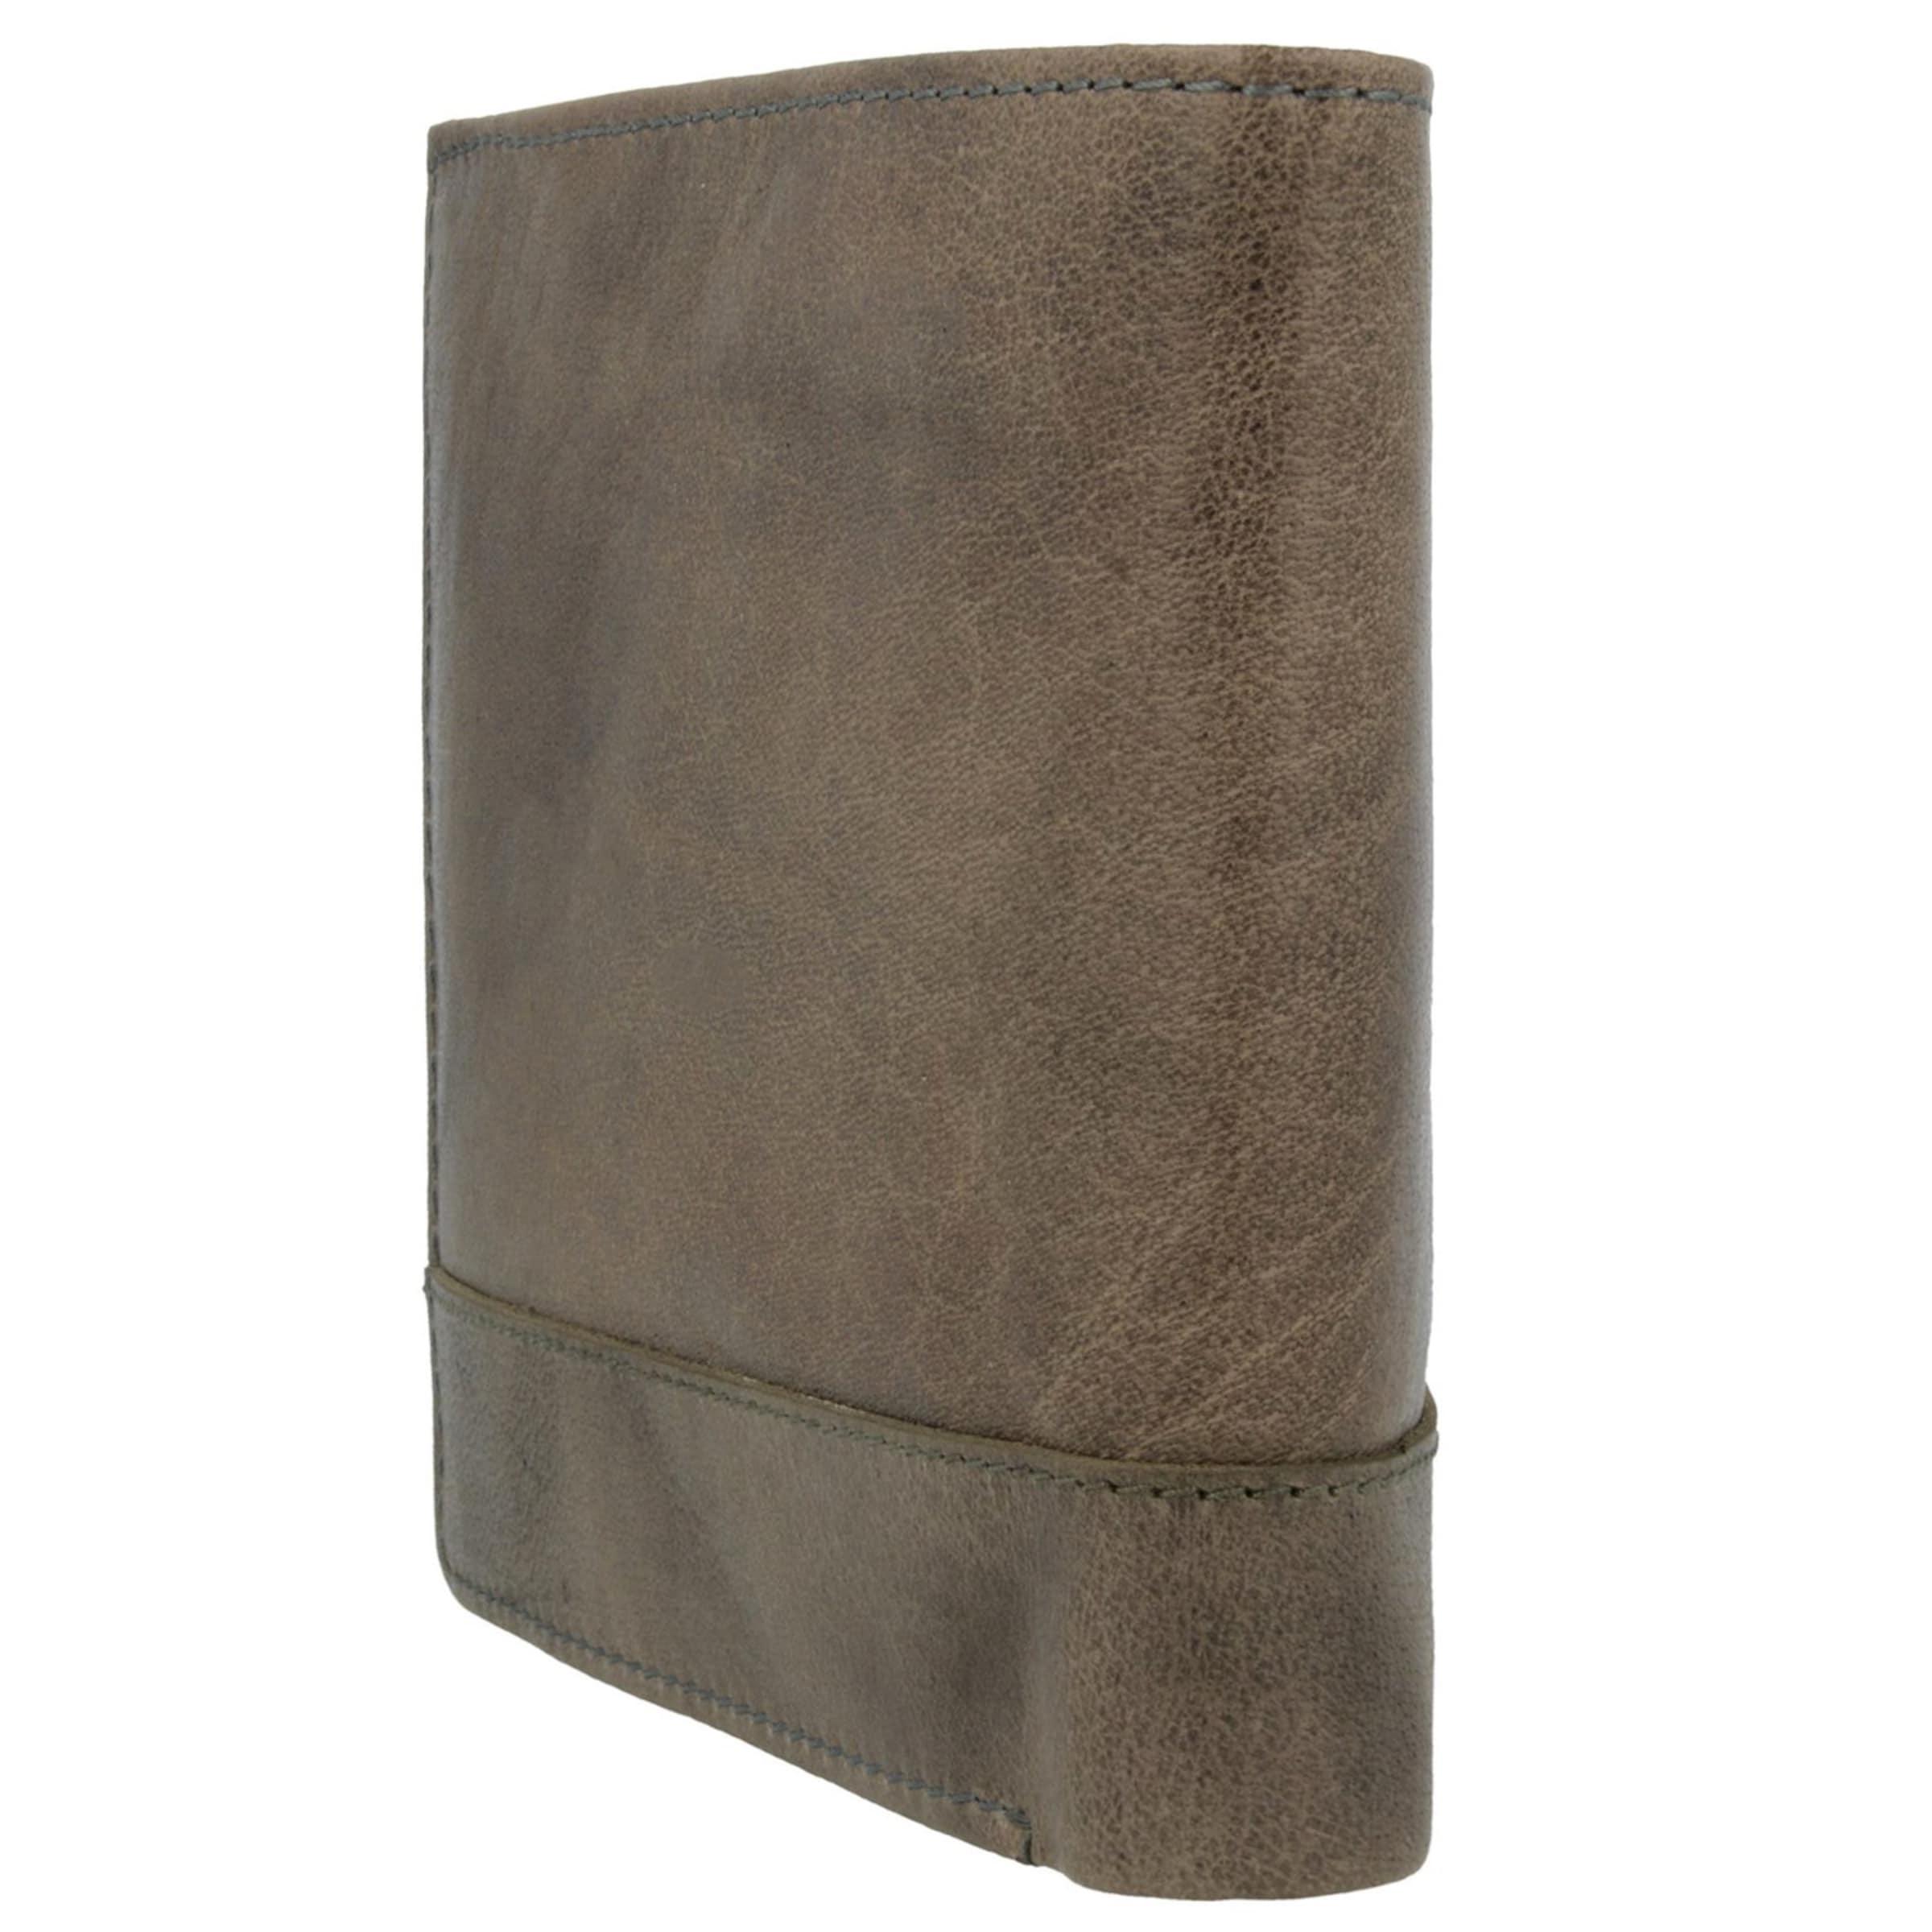 Spikes & Sparrow Bronco Geldbörse Leder 13 cm Günstig Kaufen Bilder VpREM0ErHf